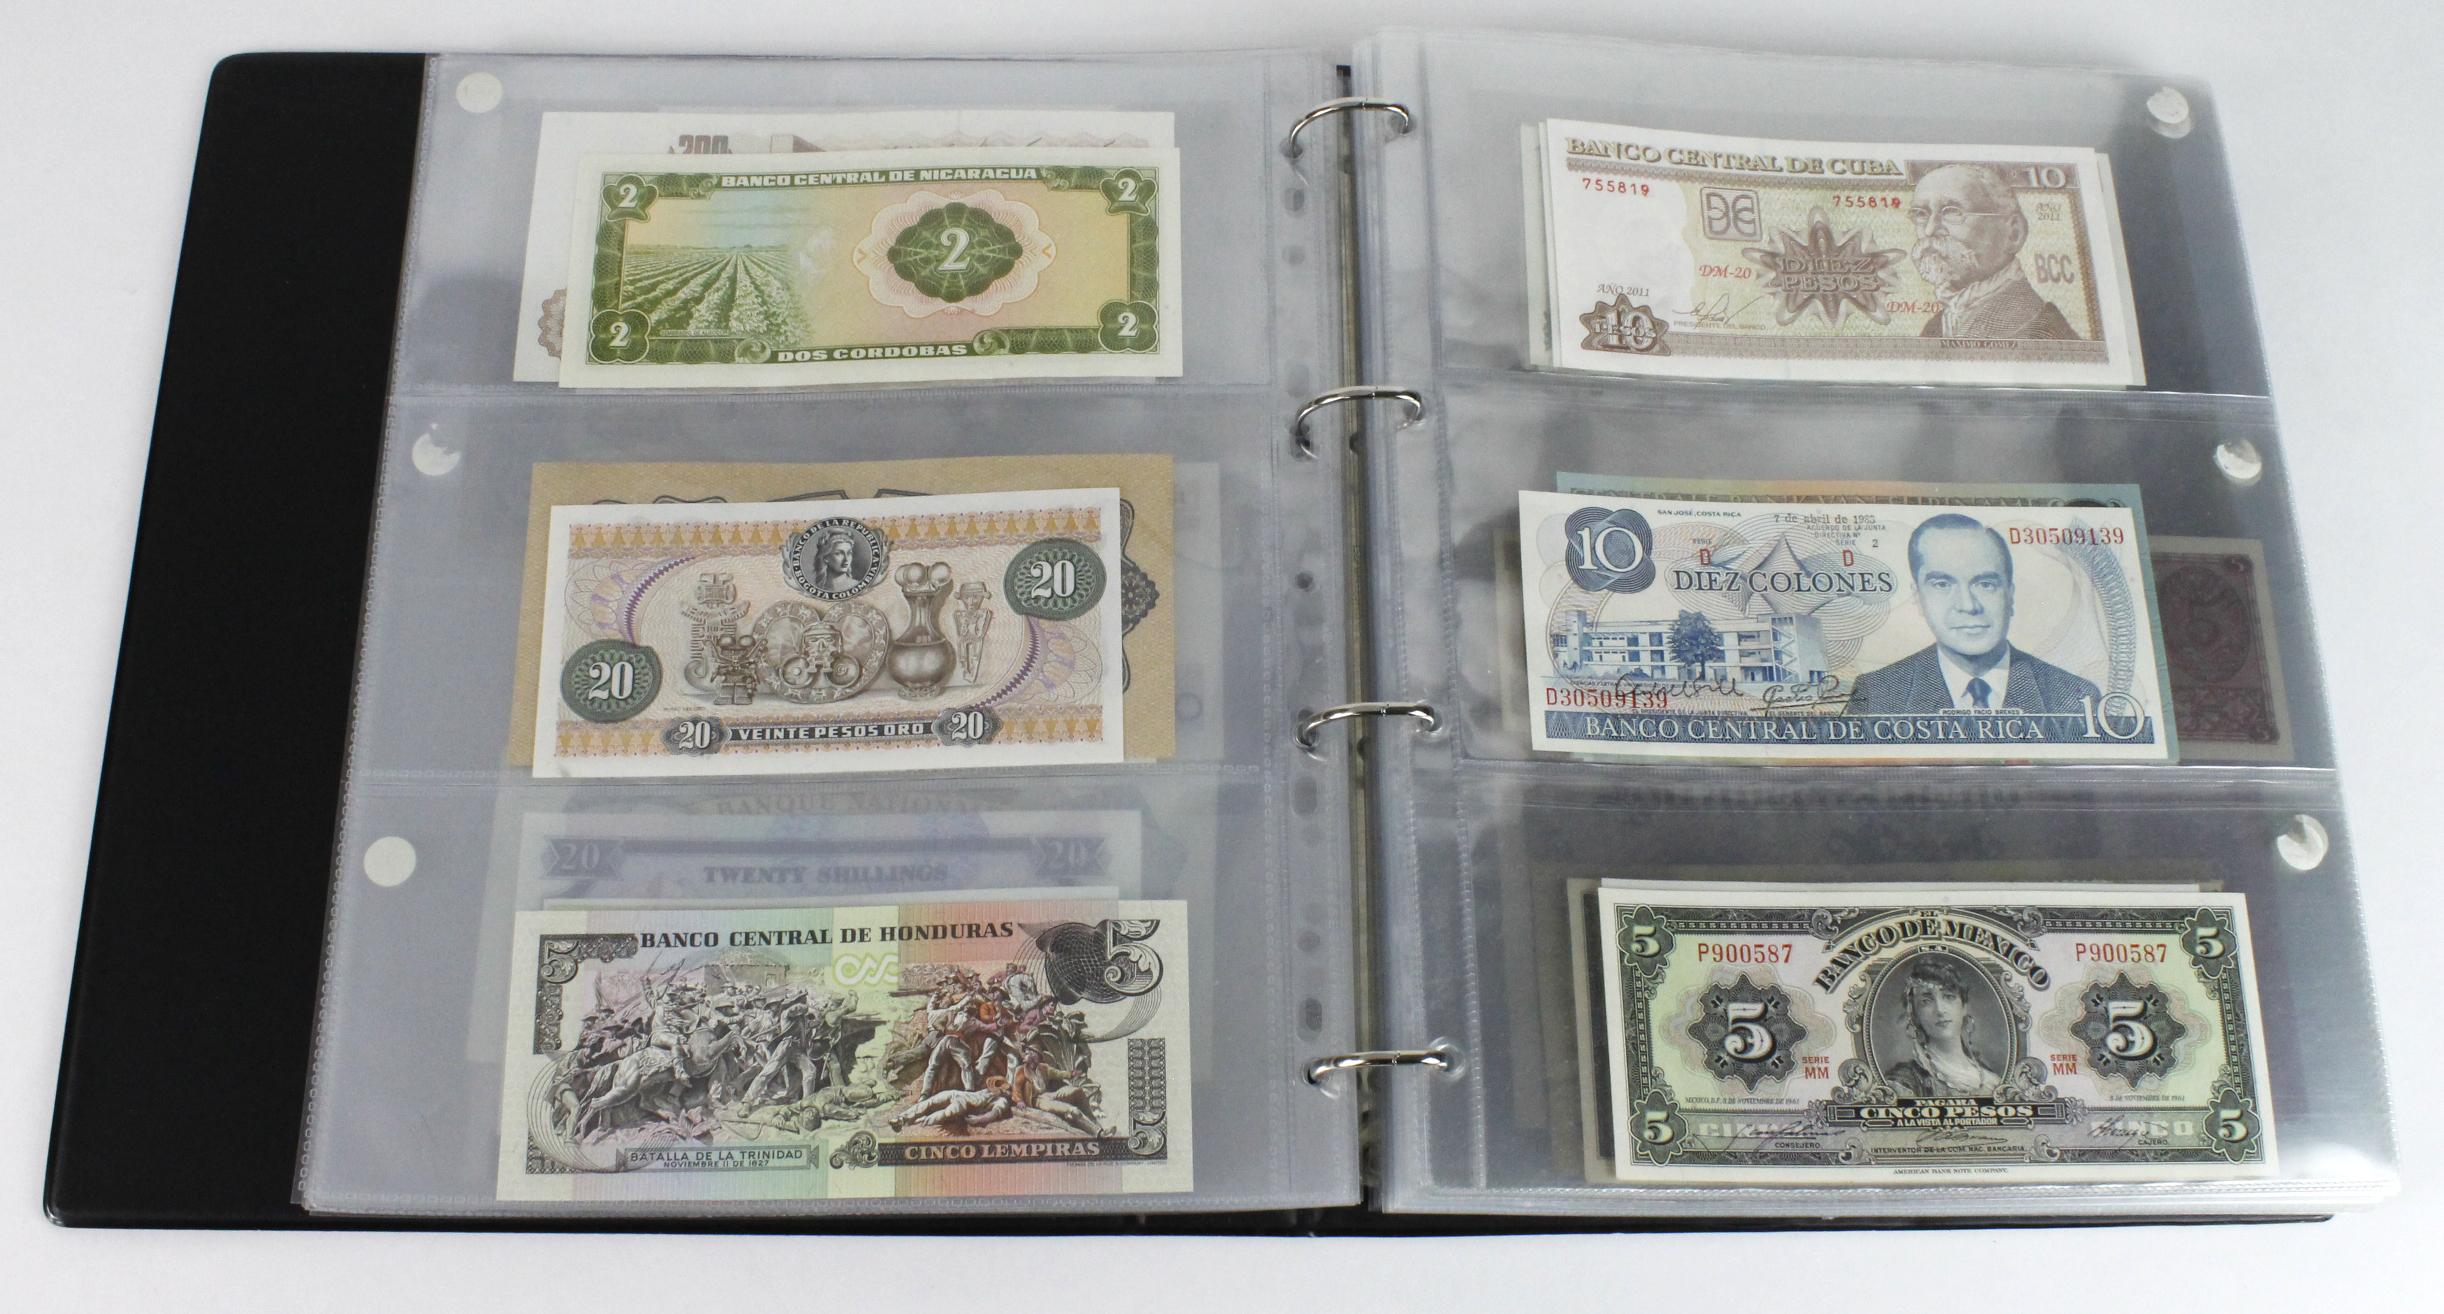 World (163), in banknote album including Bahamas, Spain, Sweden, Netherlands, Algeria, Macau, - Image 14 of 57